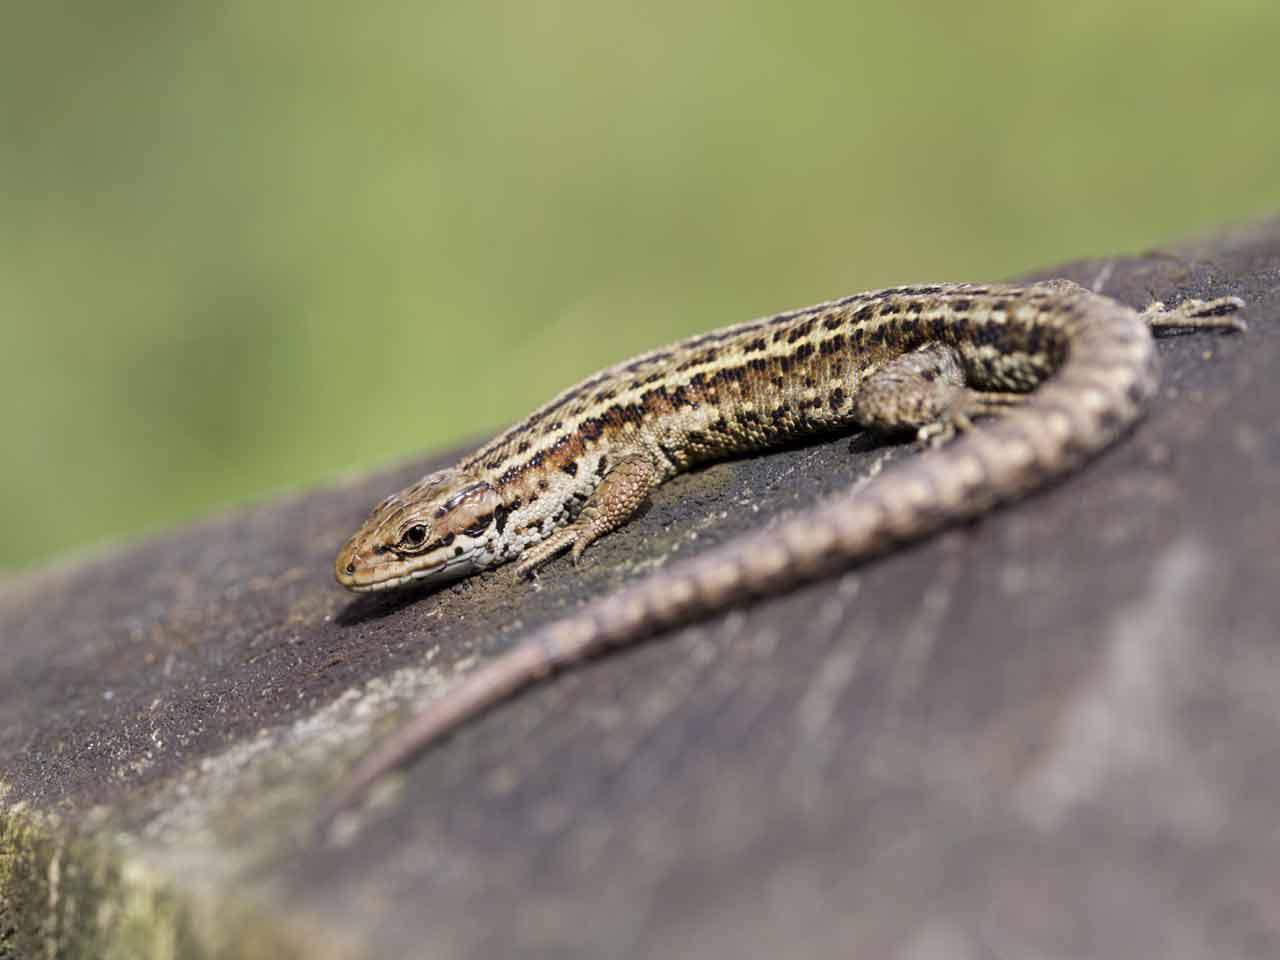 common lizard - Garden Lizard